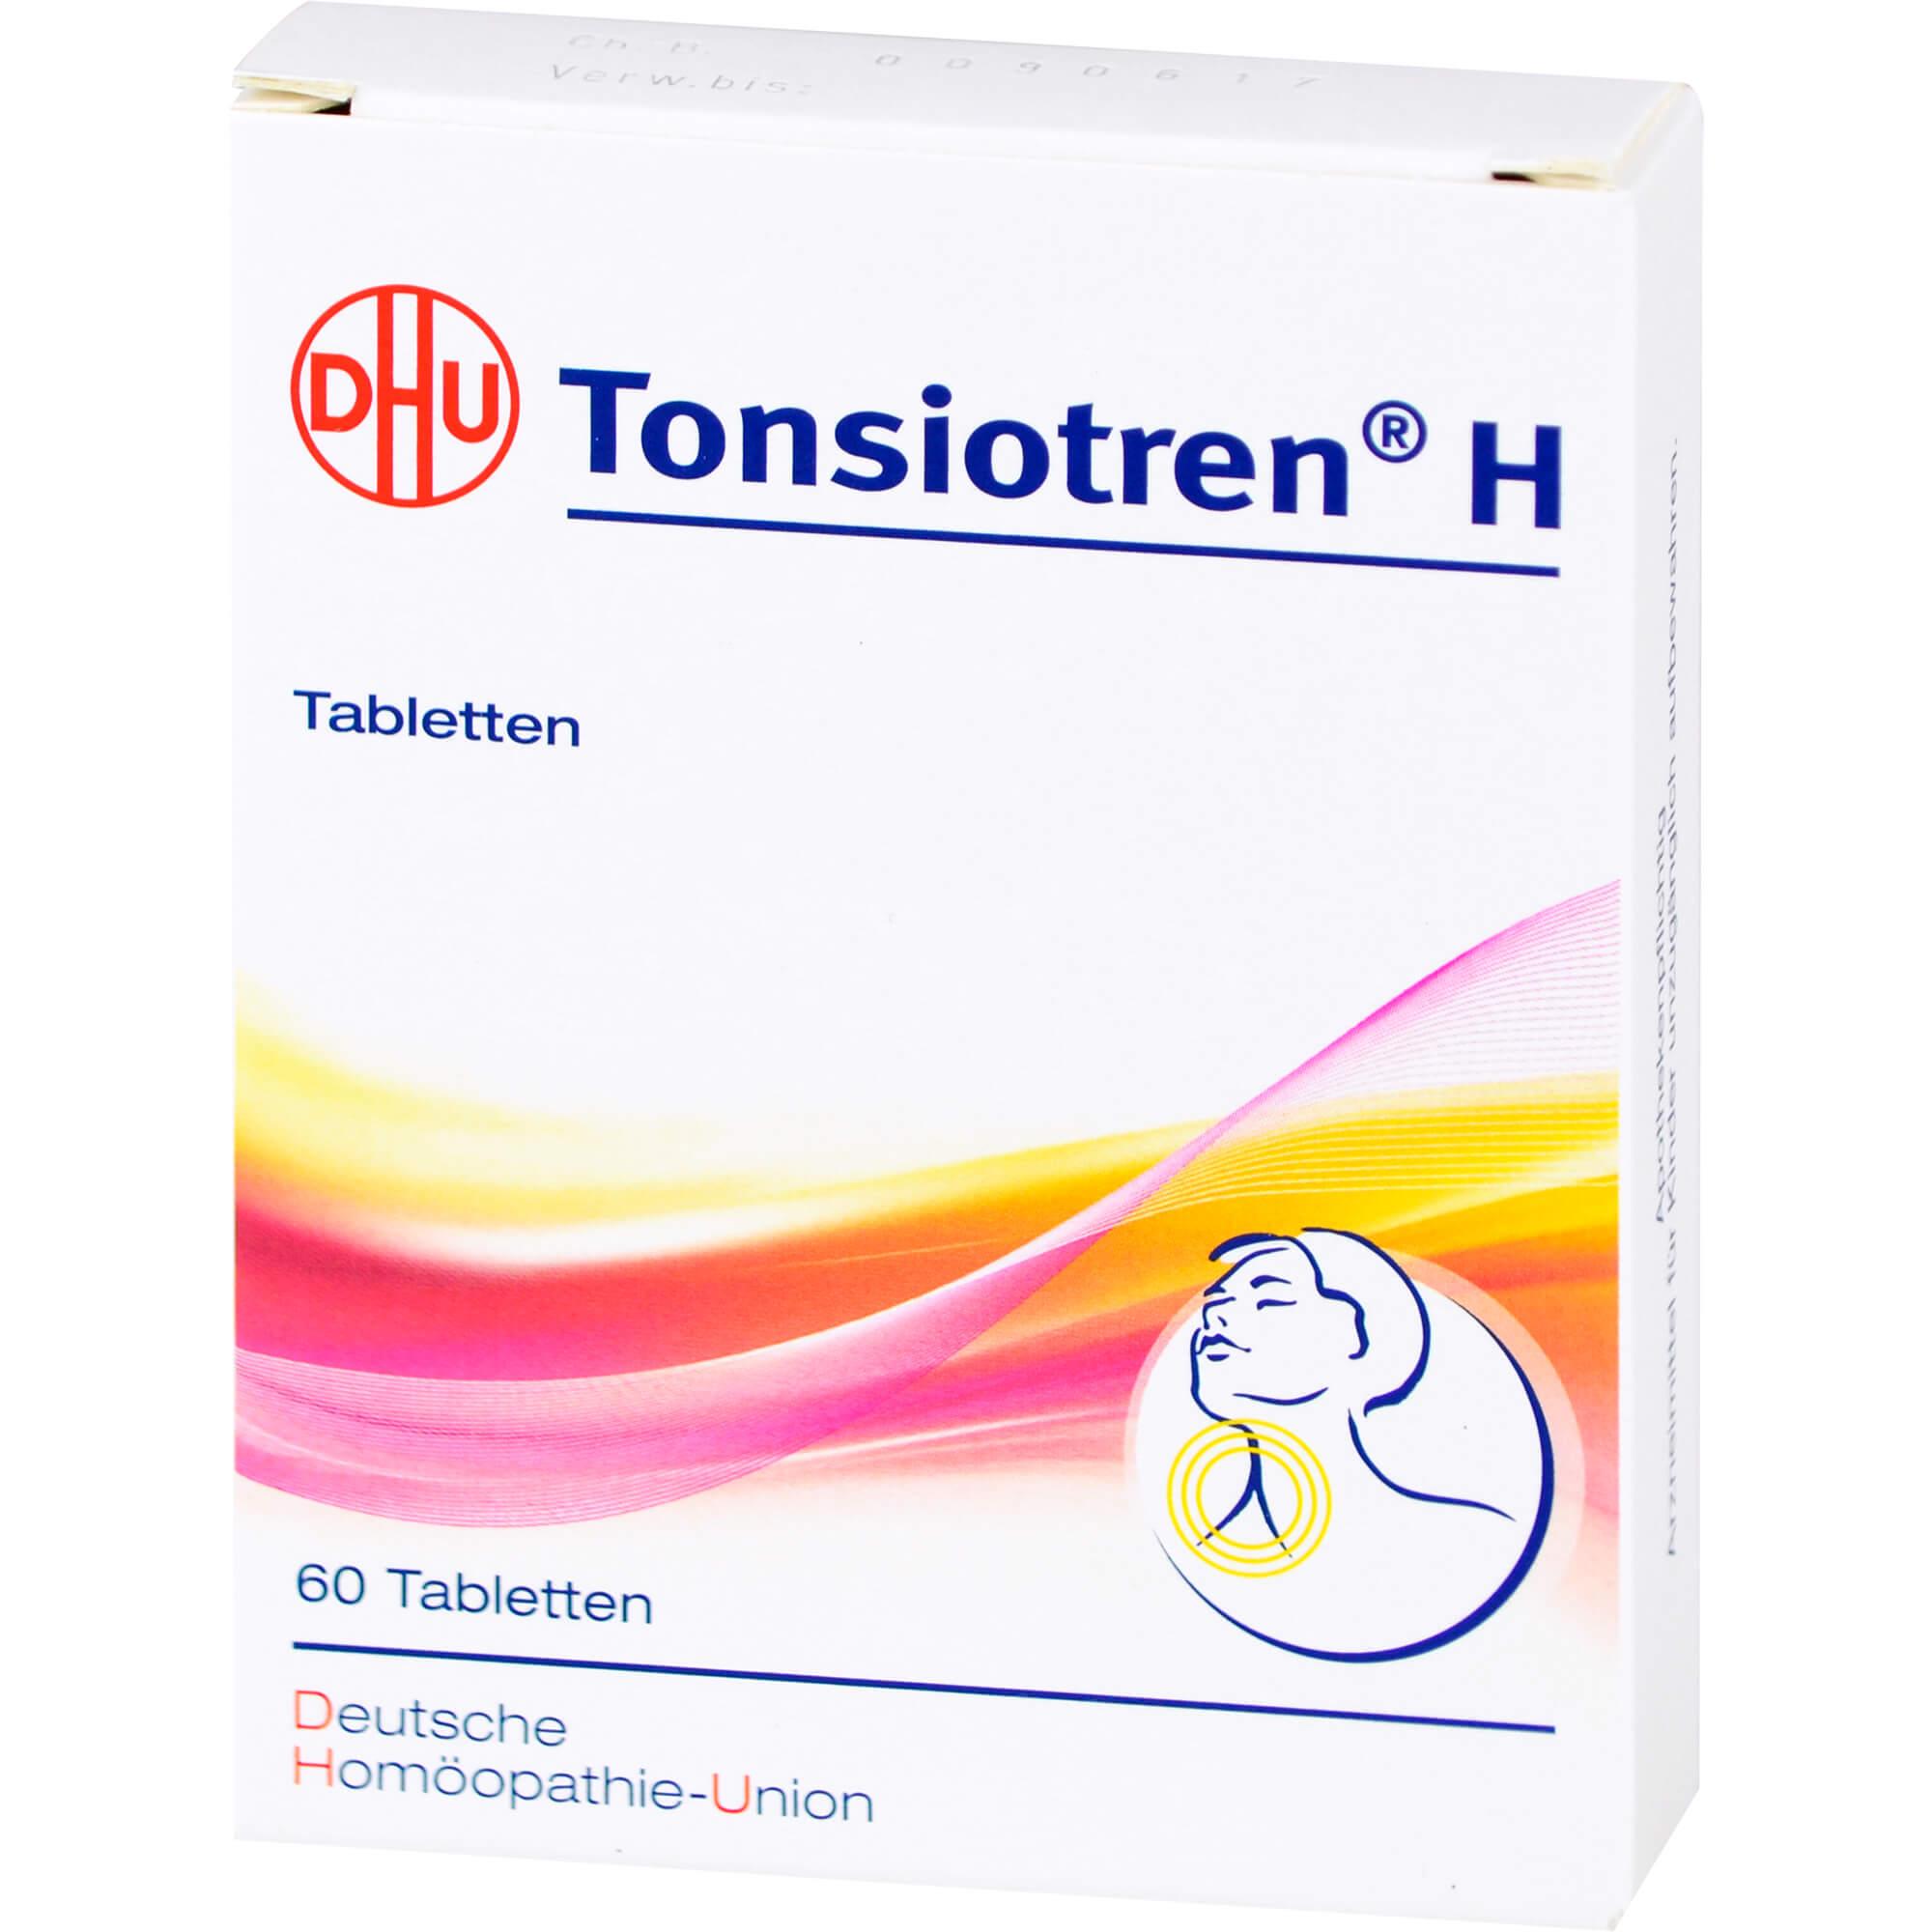 TONSIOTREN H Tabletten